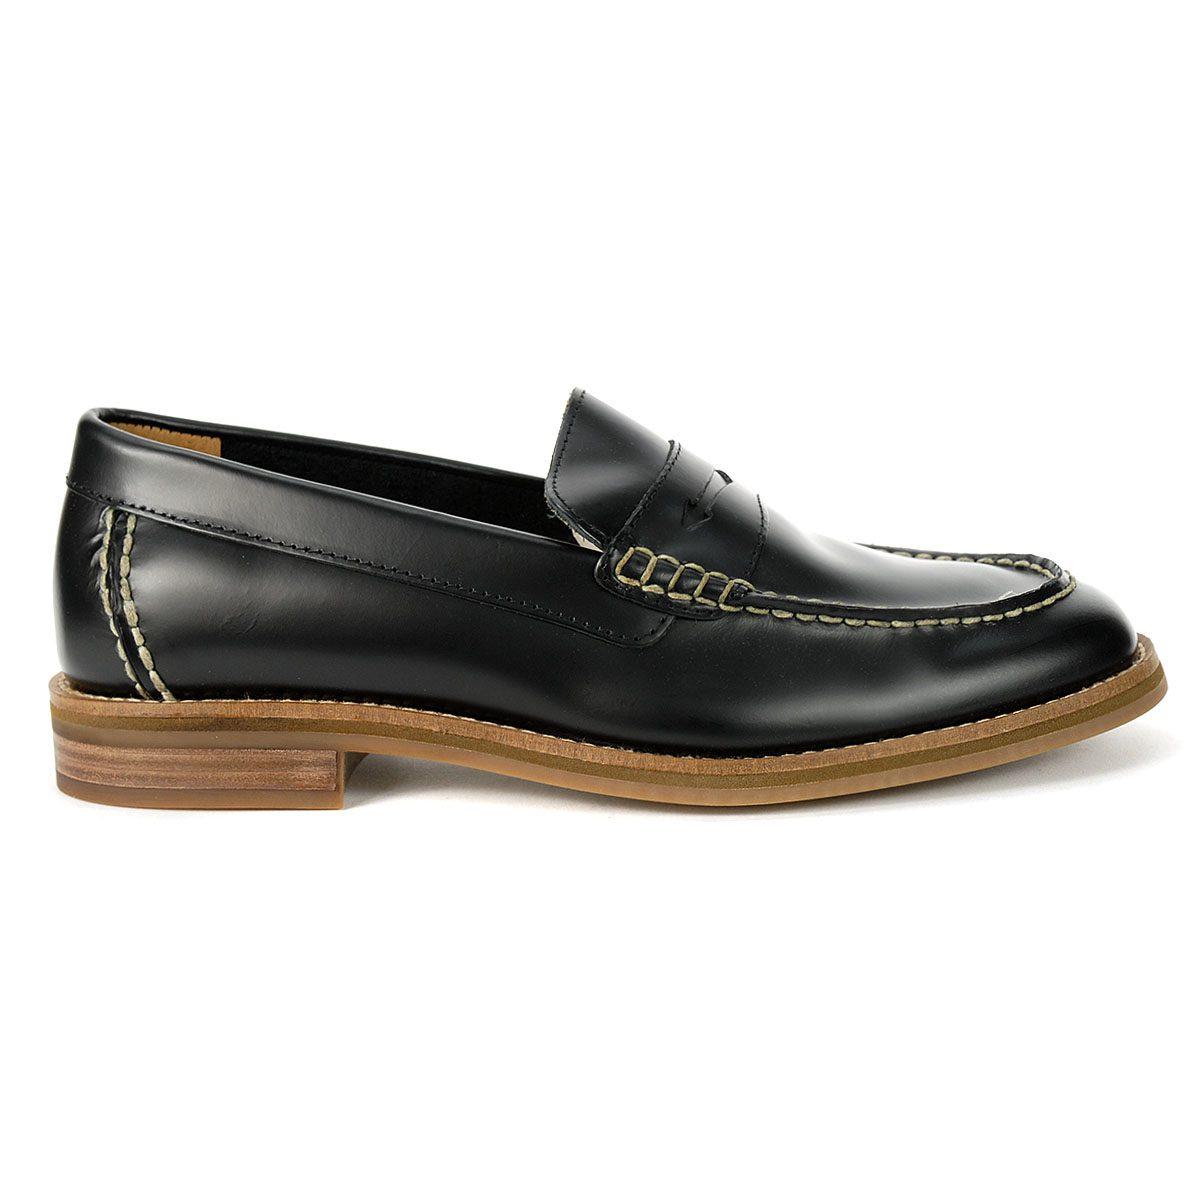 Sperry Top-Sider Men's Topsfield Penny Black Loafer ...